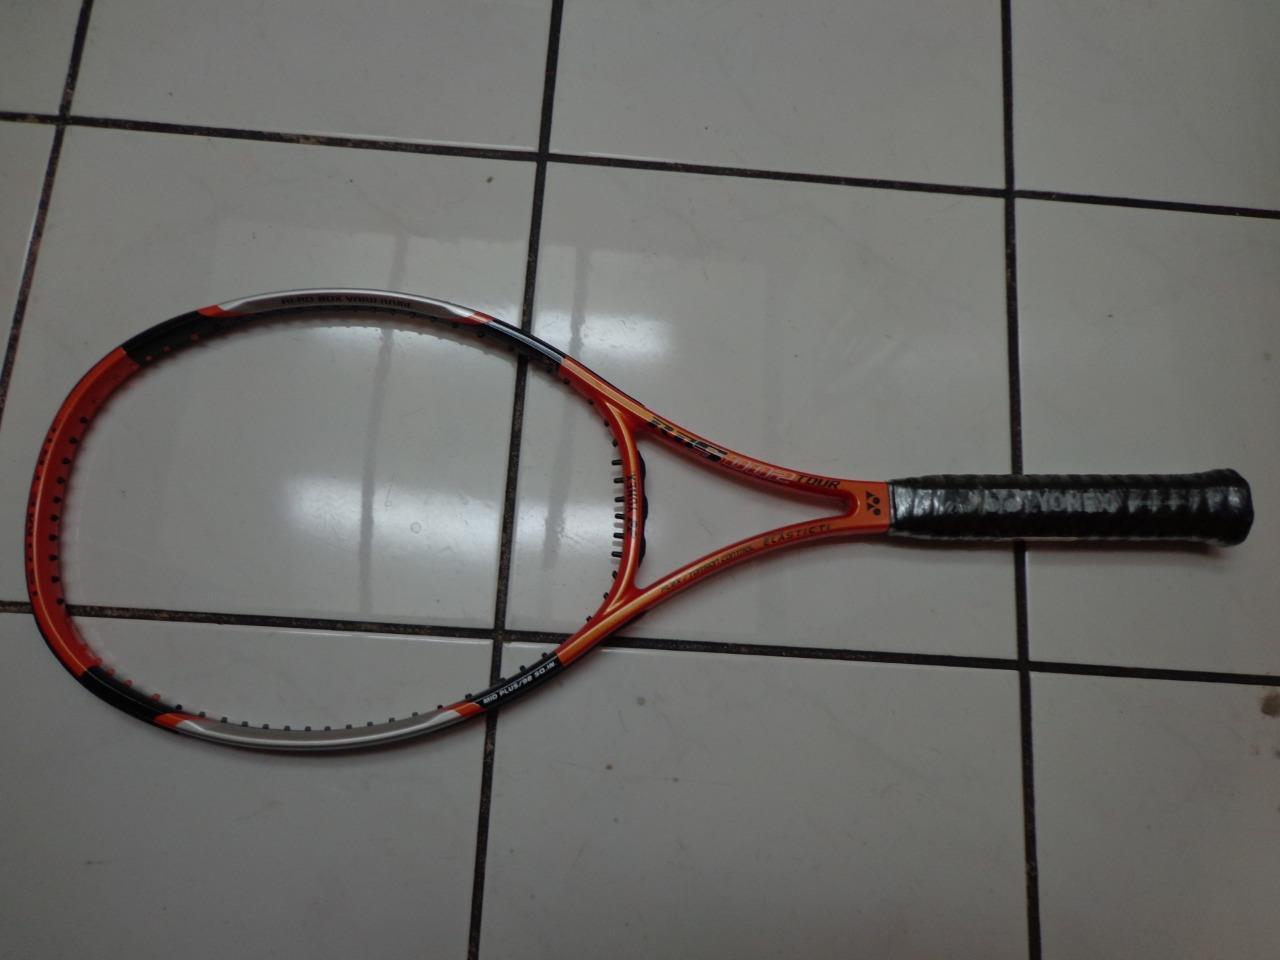 NEW Yonex RDS 002 TOUR 98 head 320339 grams 4 5 8 grip Tennis Racquet